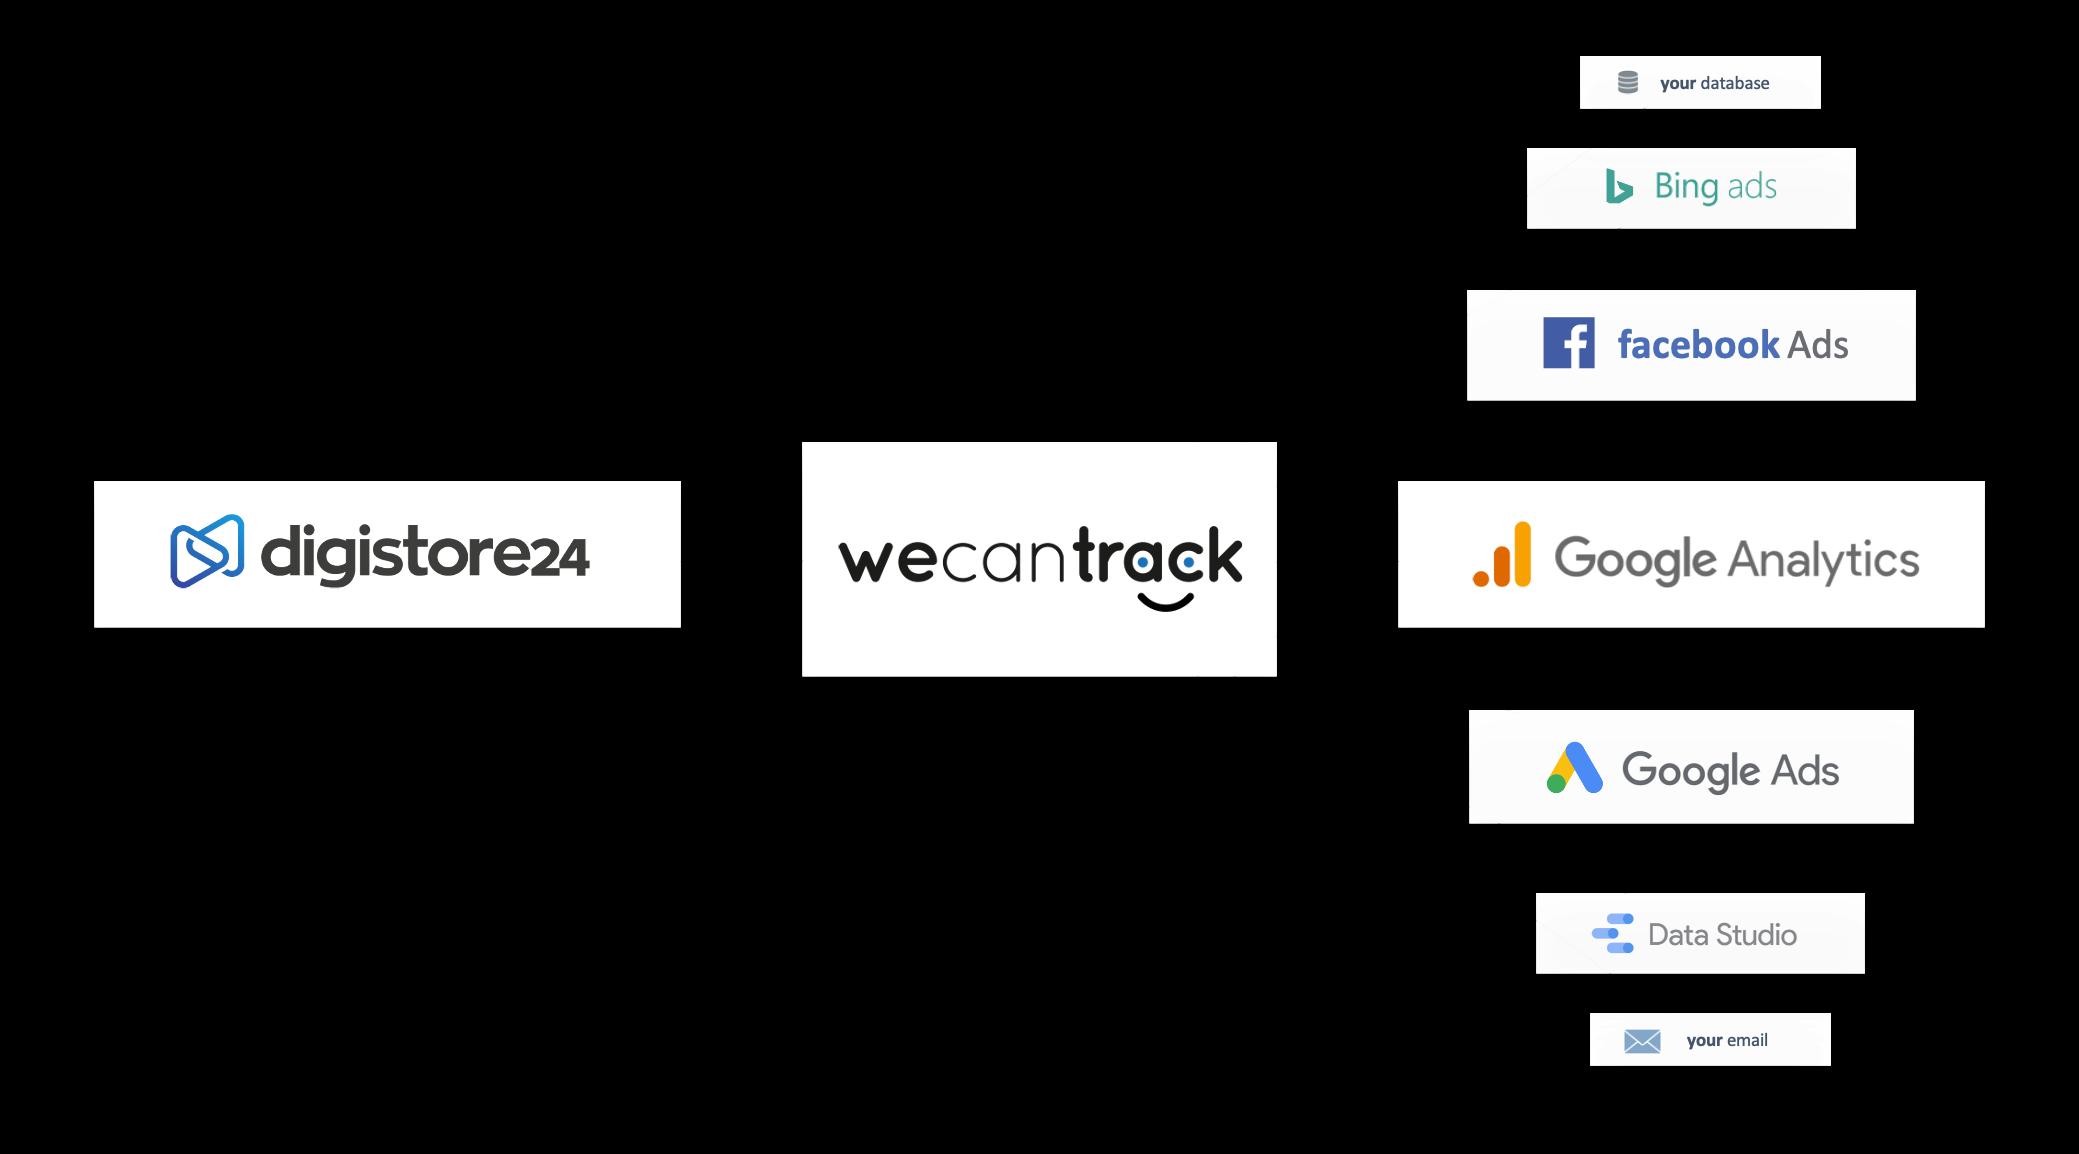 digistore24-affiliate-conversions-via-postback-url